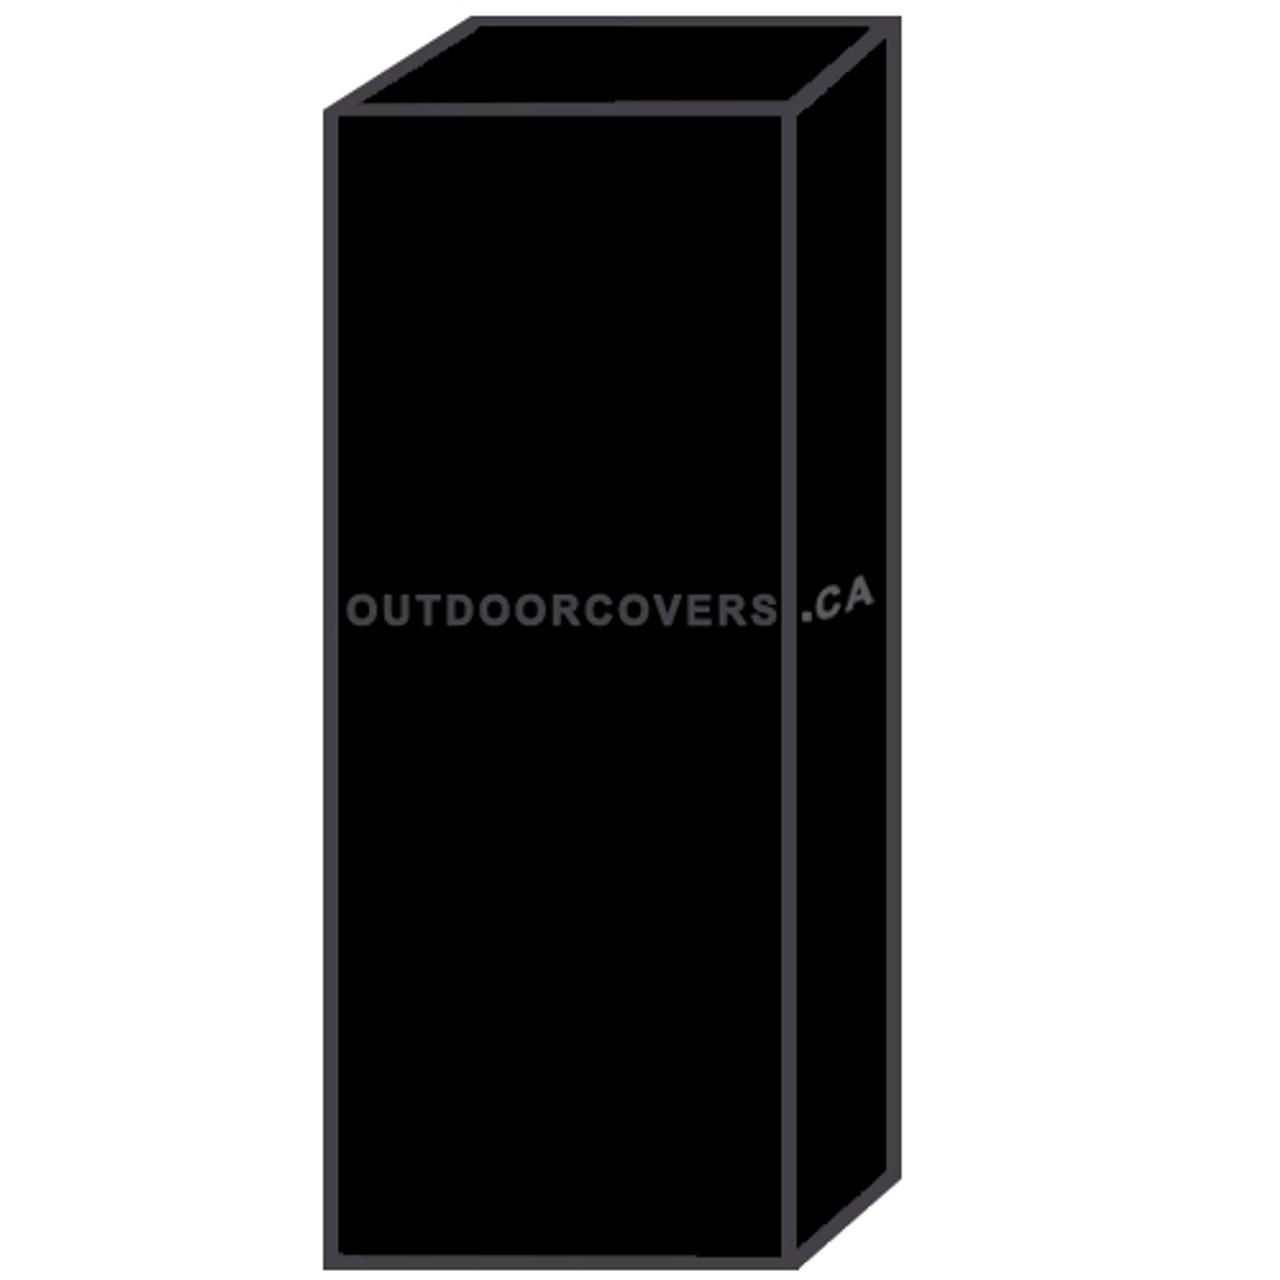 Advantage band saw cover shape